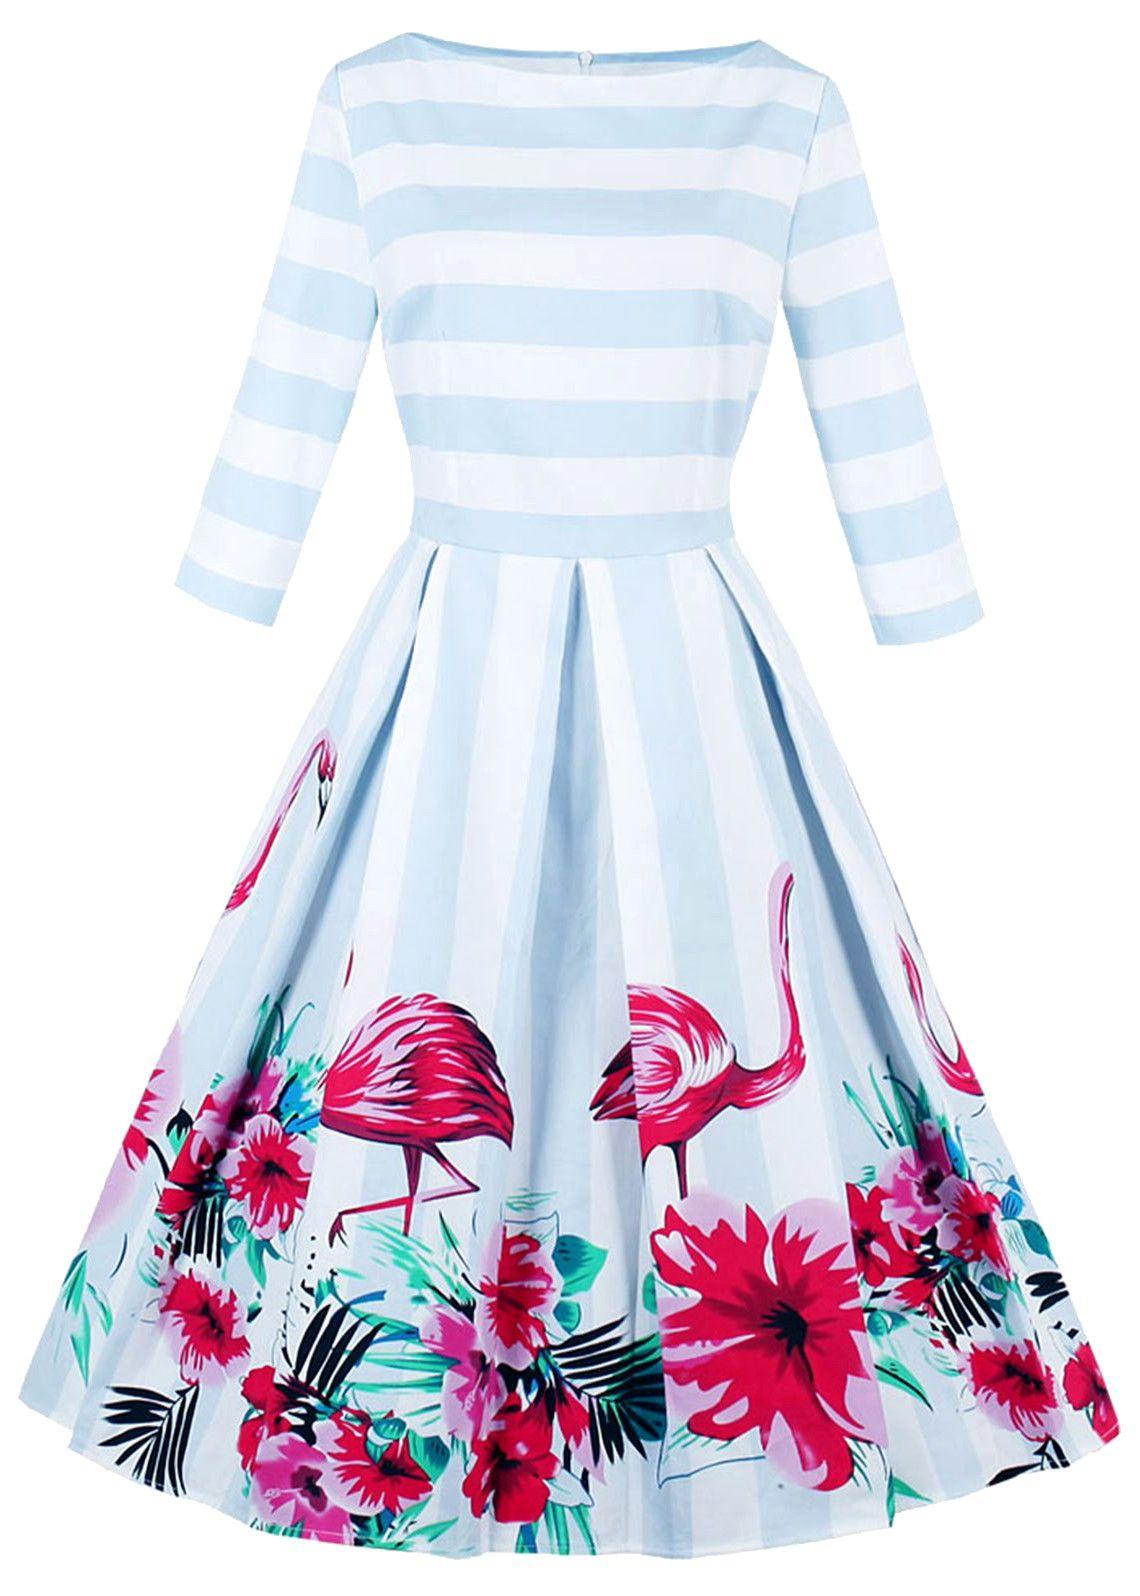 8417a02ab41 Plus Size Boat Neck Striped Floral Flamingo Print Dress